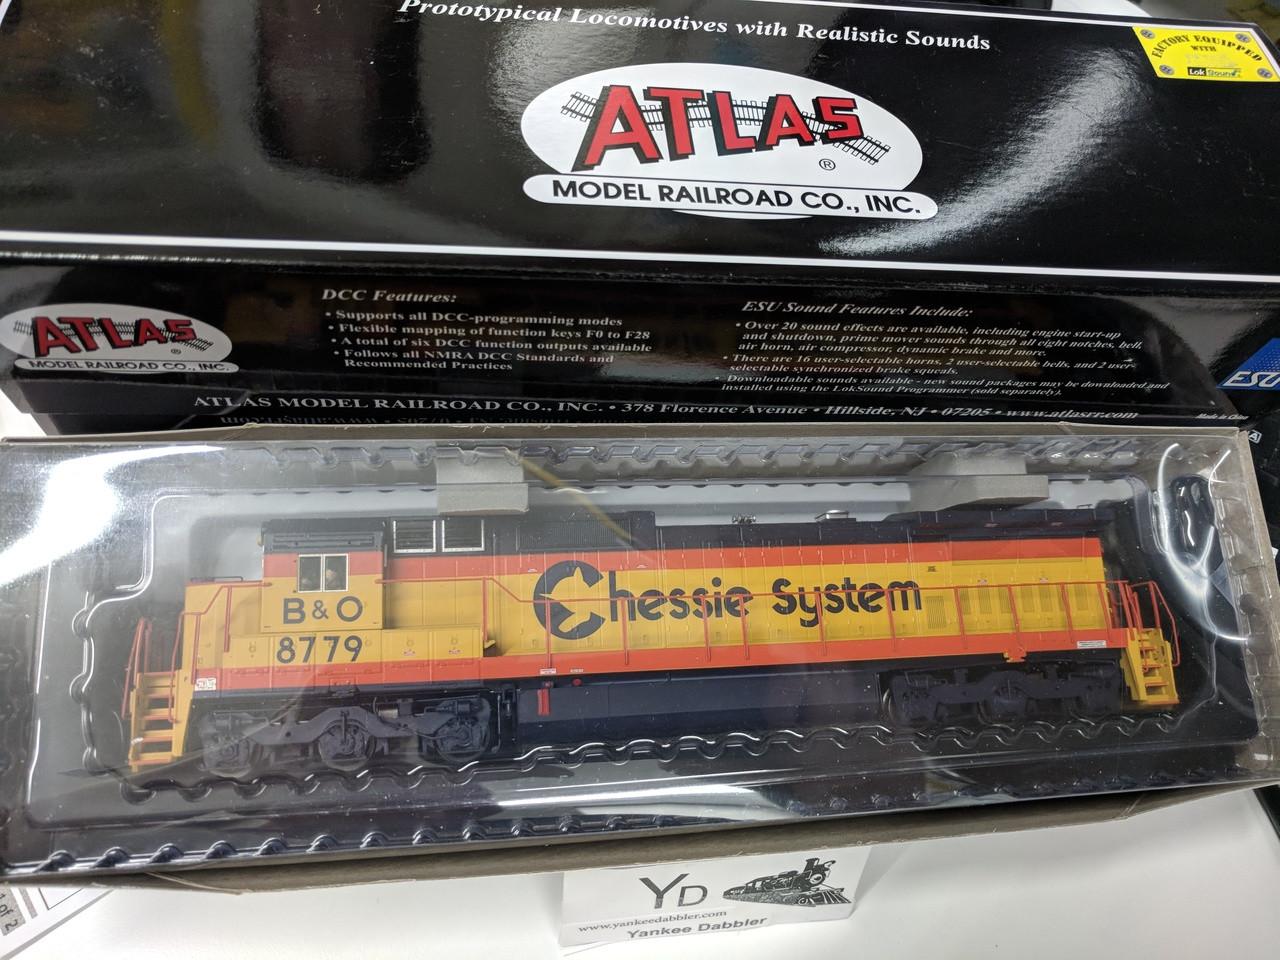 ATLAS 10002293 / Atlas Model Railroad Co. GE Dash 8-40CW #8779 Chessie System(B&O) w/LokSound & DCC - Master(R) Gold (SCALE=HO Part # 150-10002293